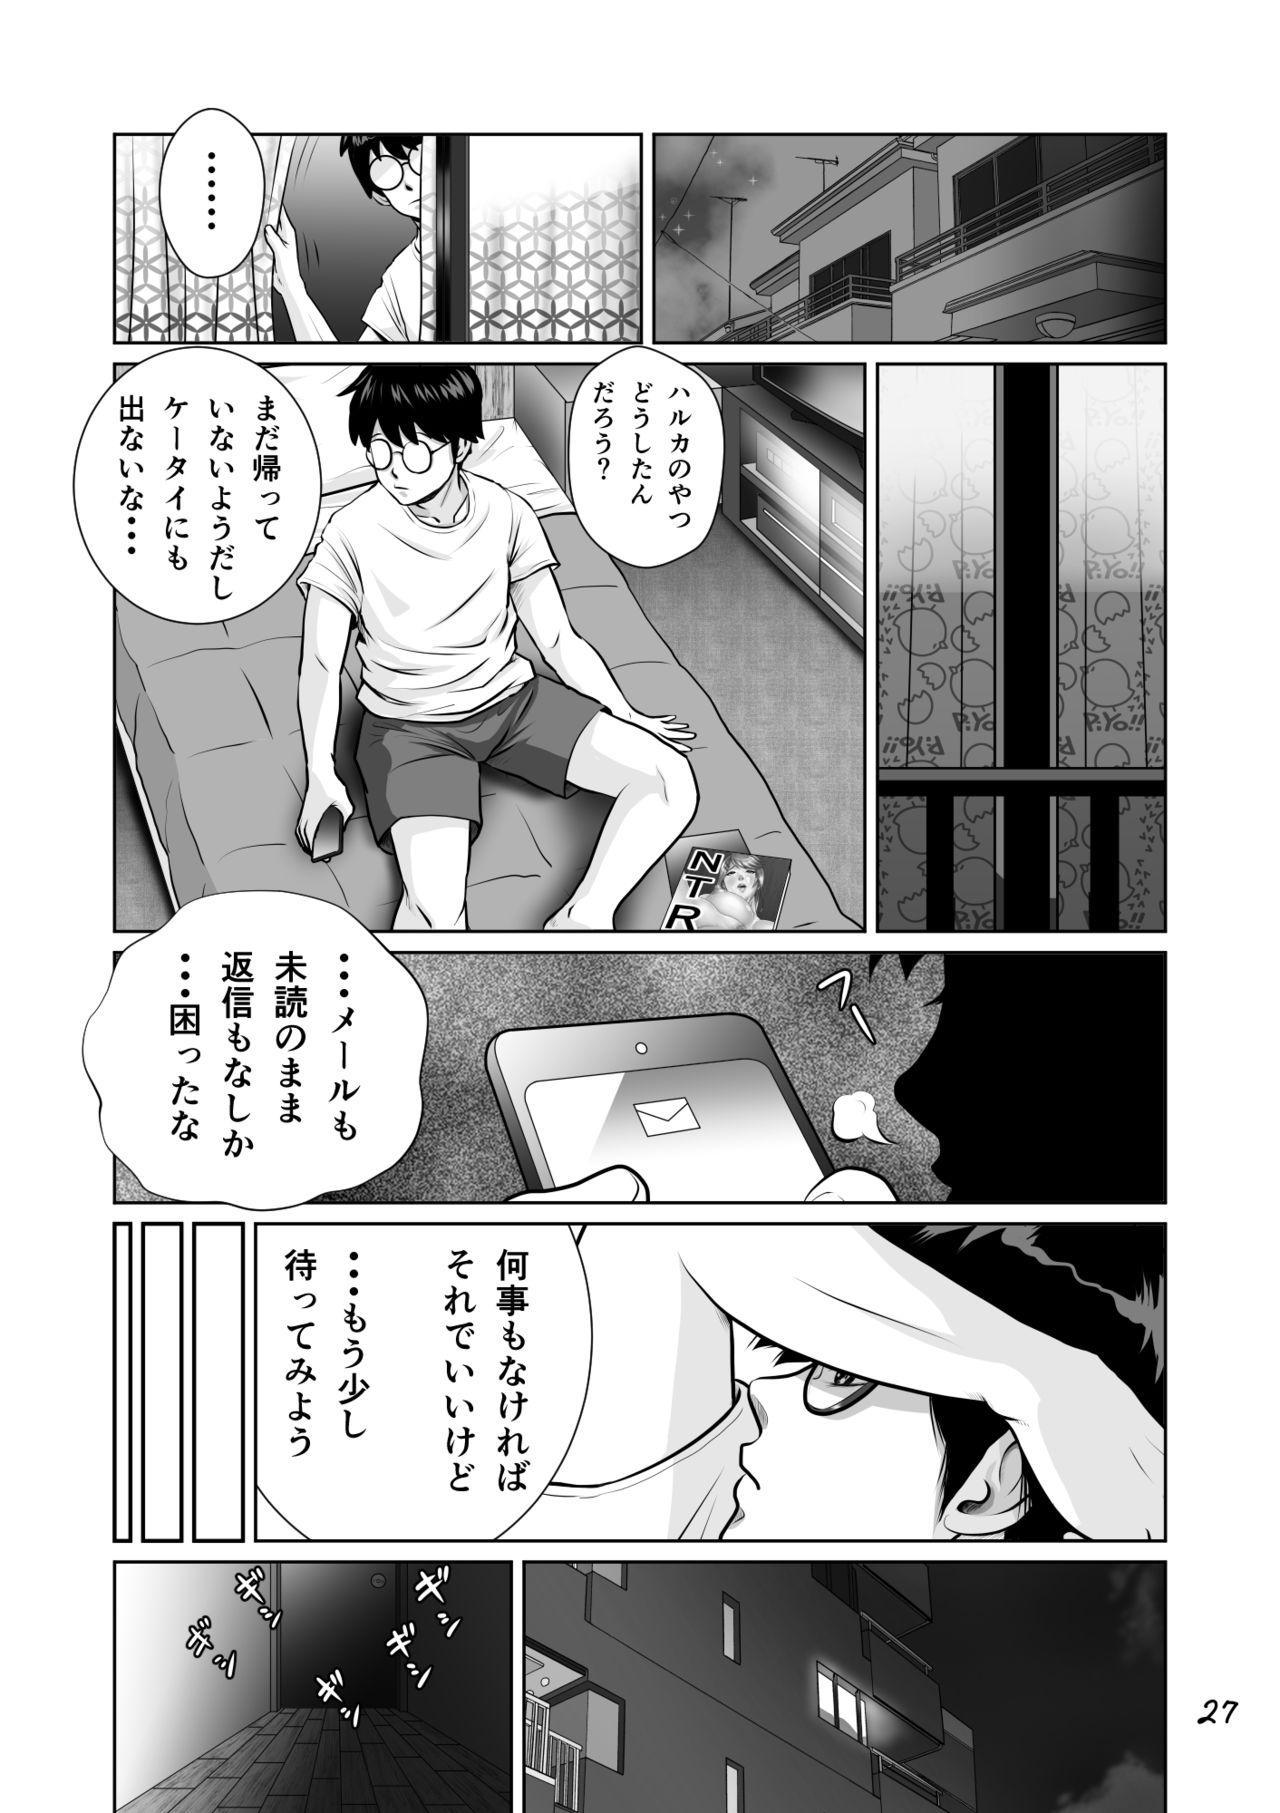 Netorare Osananajimi Haruka-chan Kiki Ippatsu!! 27